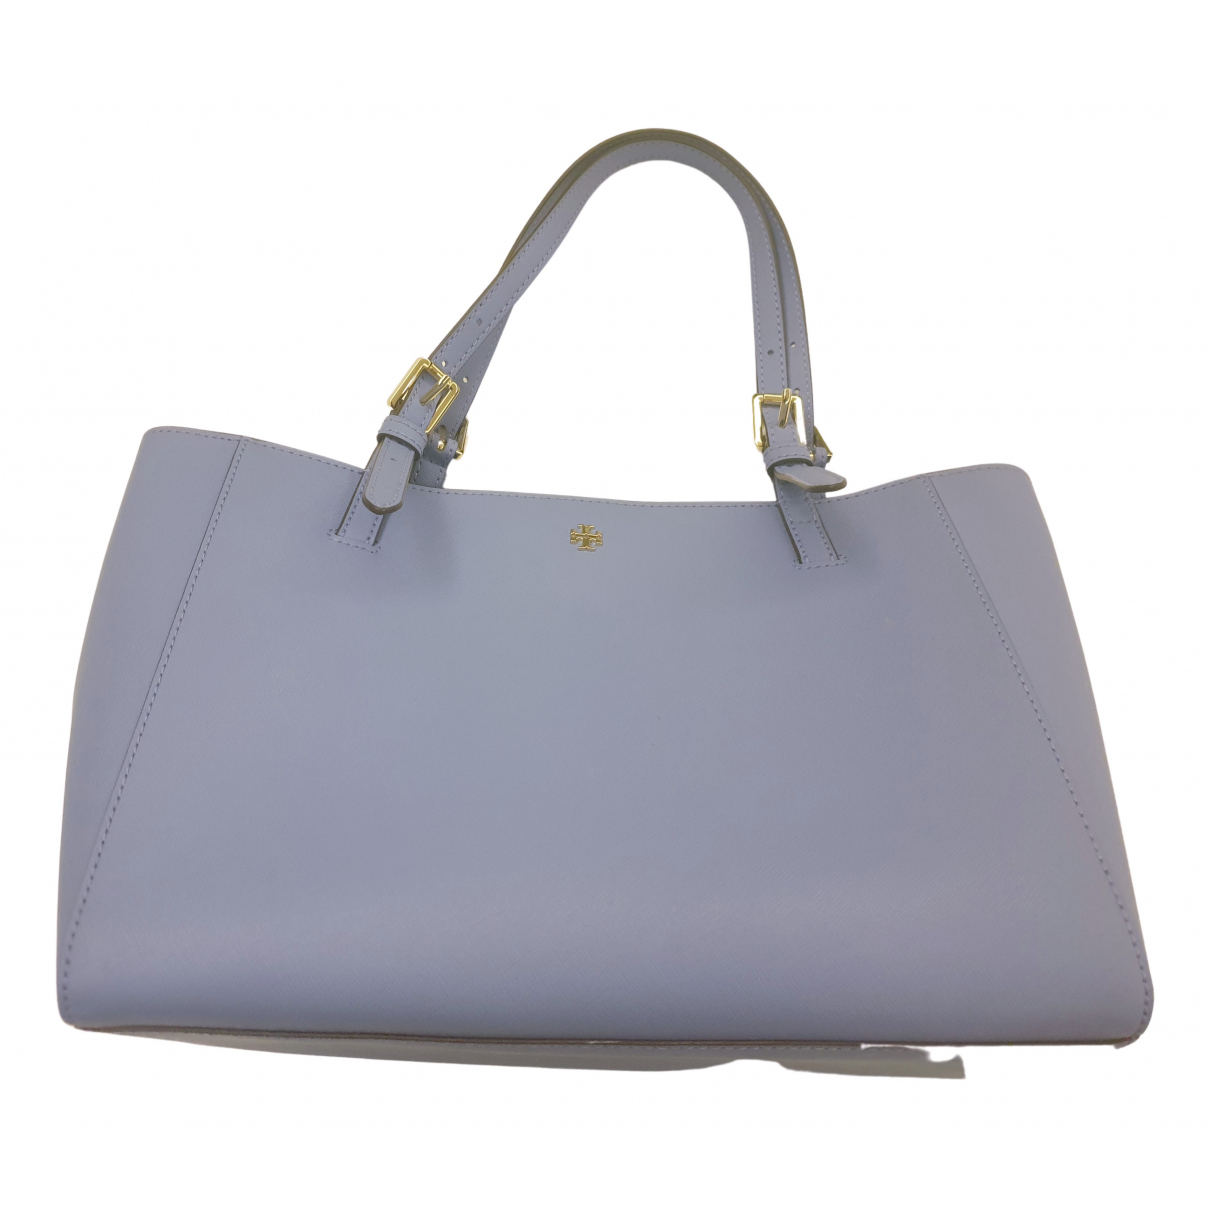 Tory Burch N Blue Leather handbag for Women N